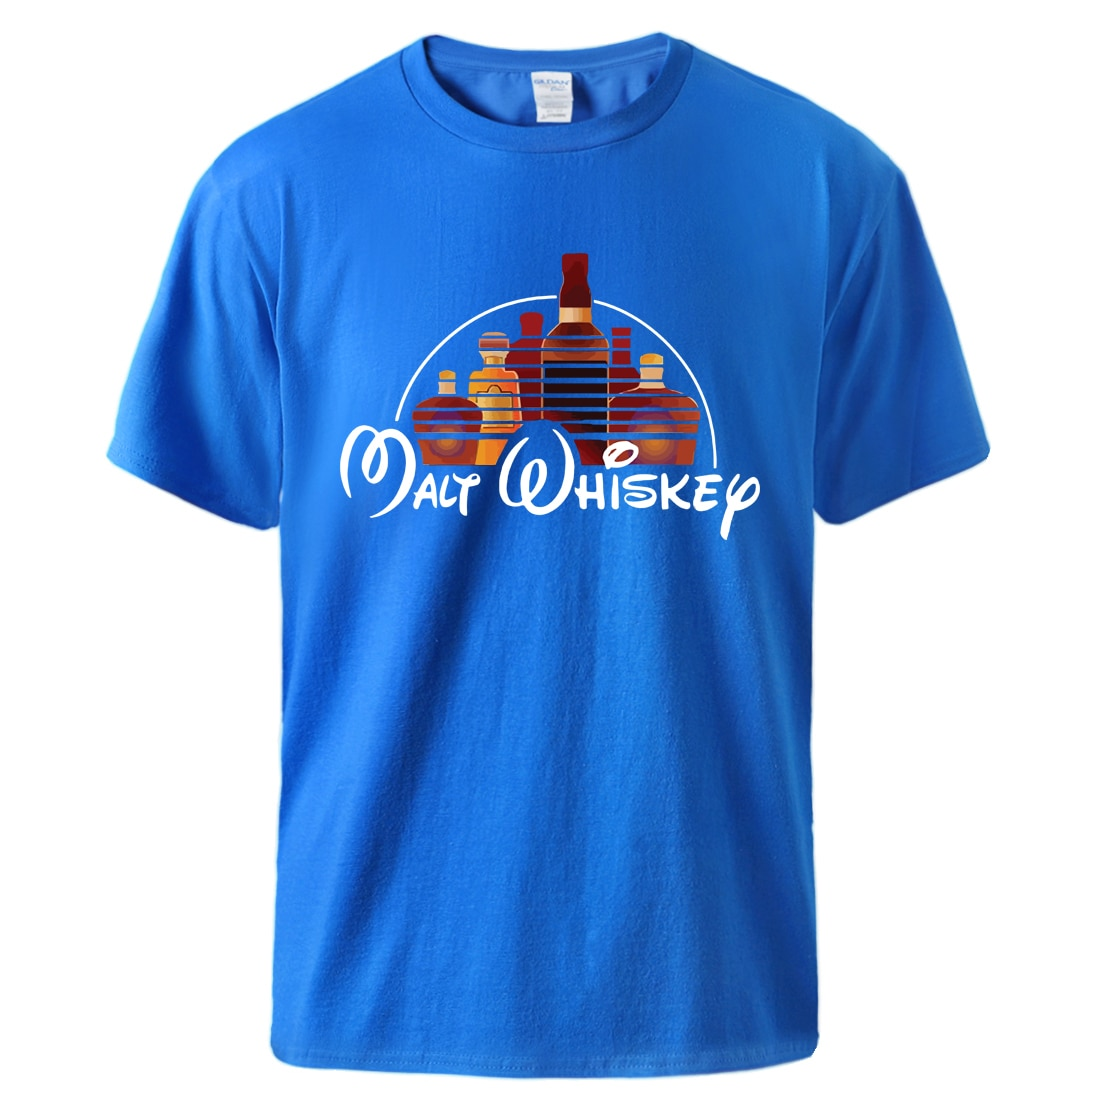 Malt Whiskey Mens Tee Summer Cotton Short Sleeve Tshirts 2020 Male Hot Sell Fashion Sportswear Tshirts Homme Causal Sportswear